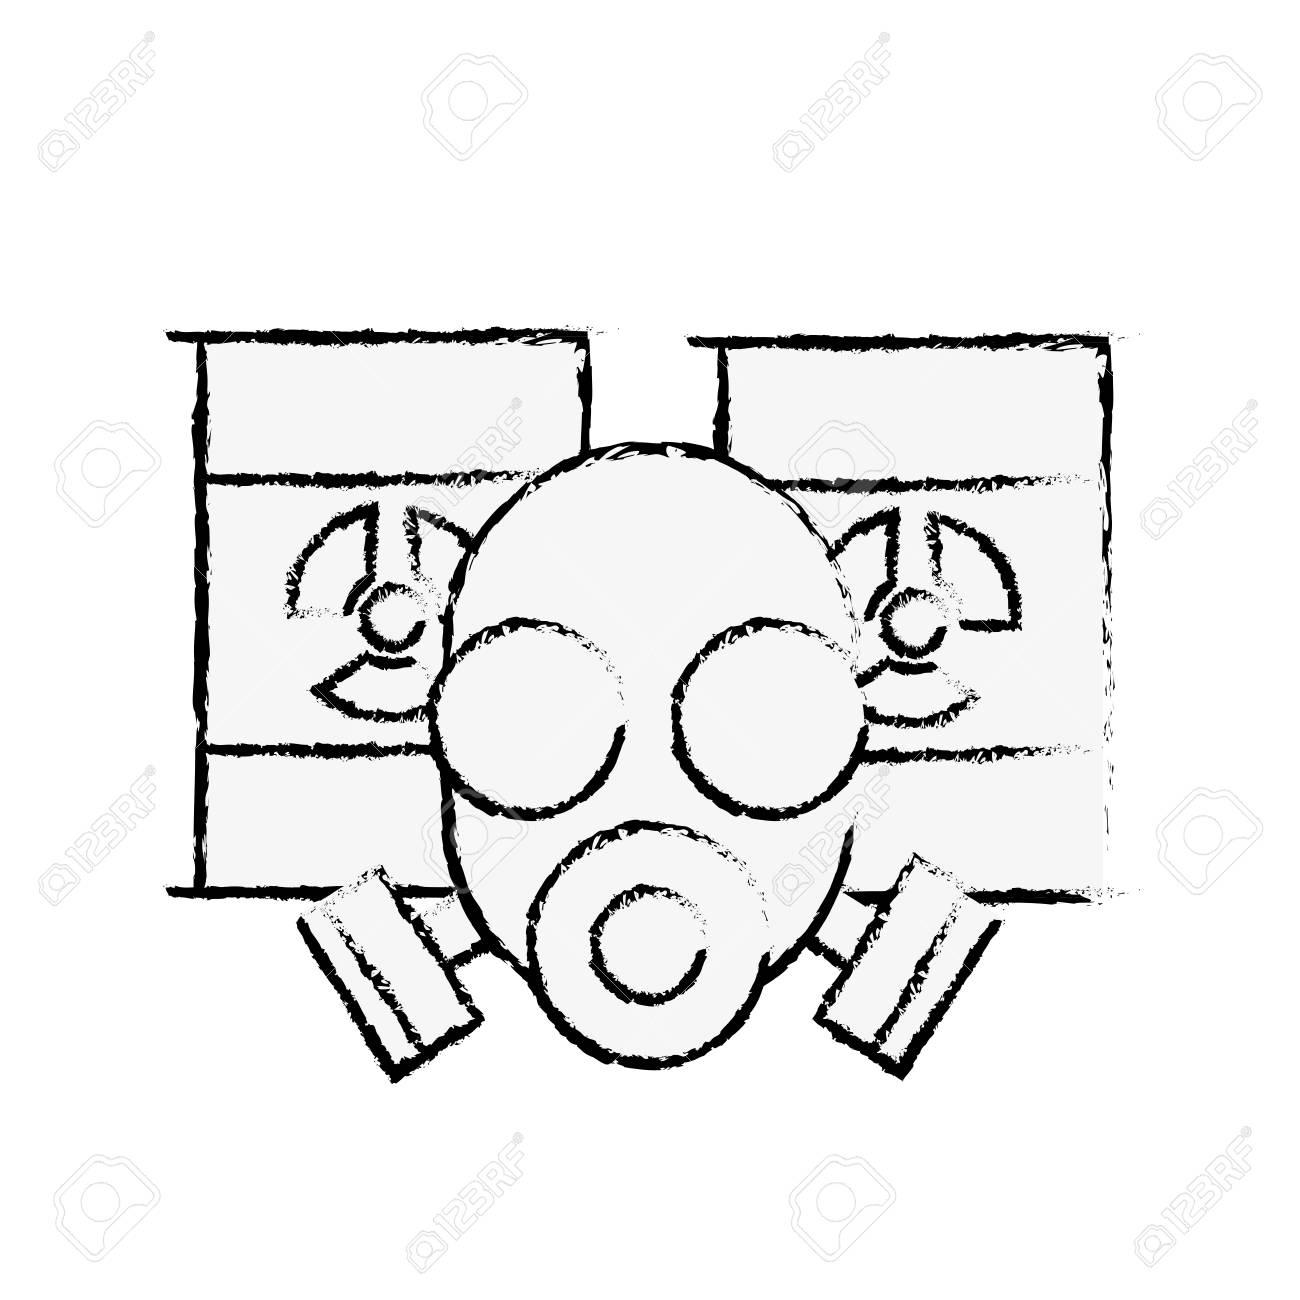 respirator protective mask and hazard barrels vector illustration hand drawing - 108263091